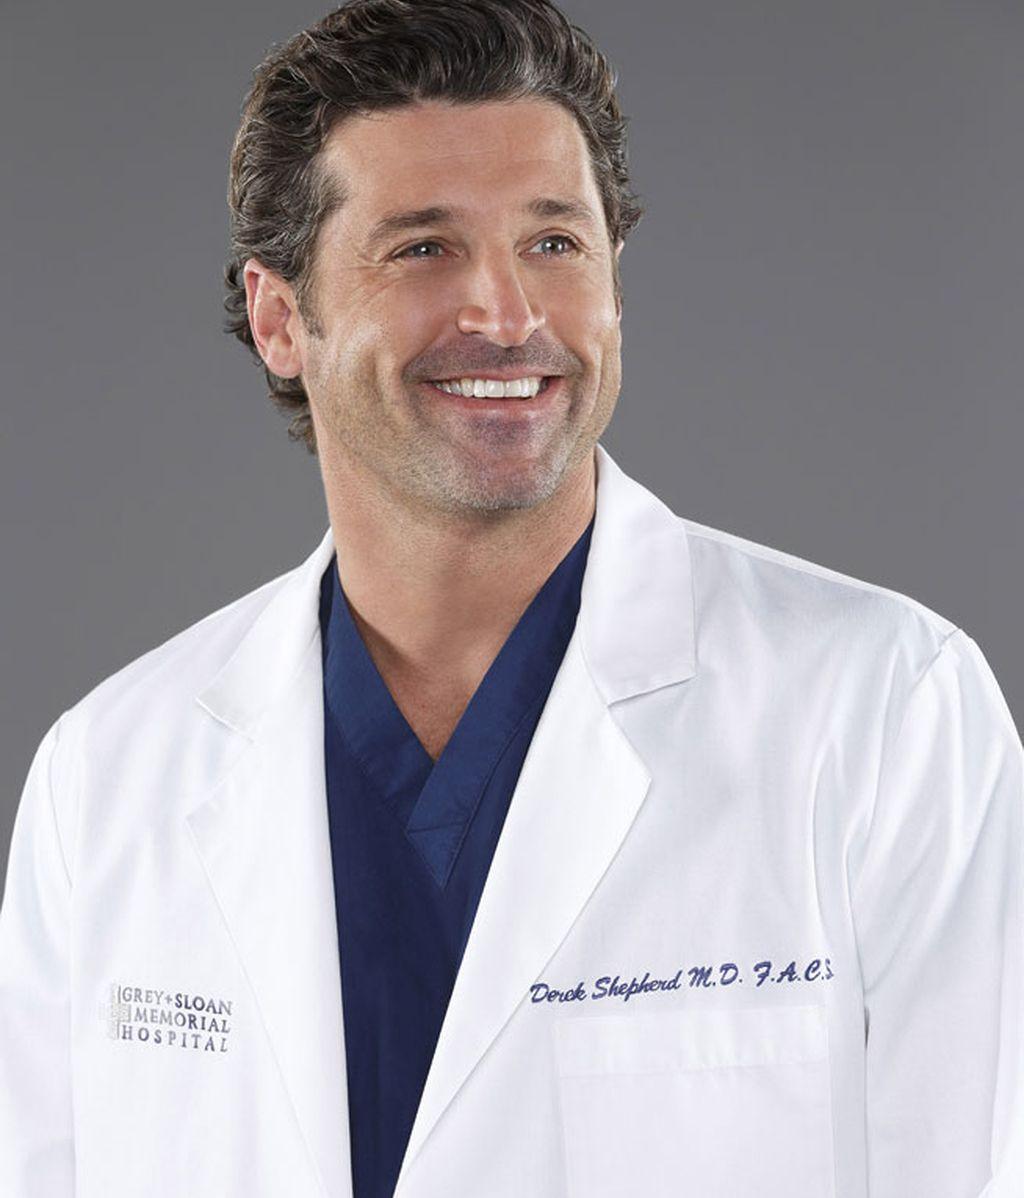 Patrick Dempsey da vida al neurocirujano Derek Shepherd, marido de Grey